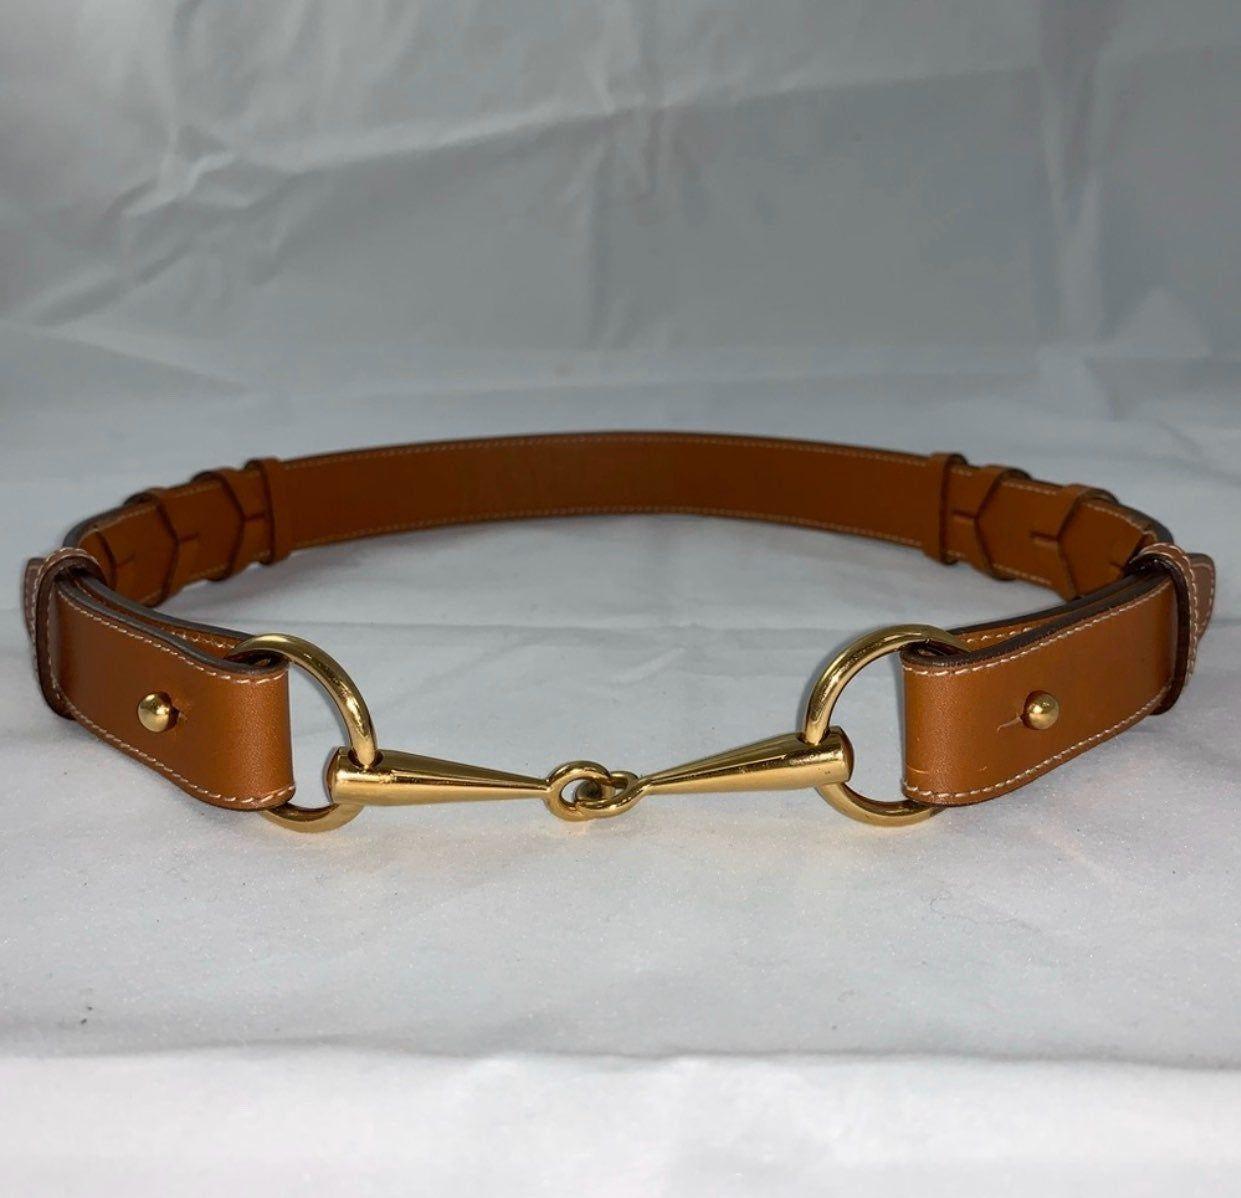 Authentic gucci horsebit buckle belt in cognac fits a